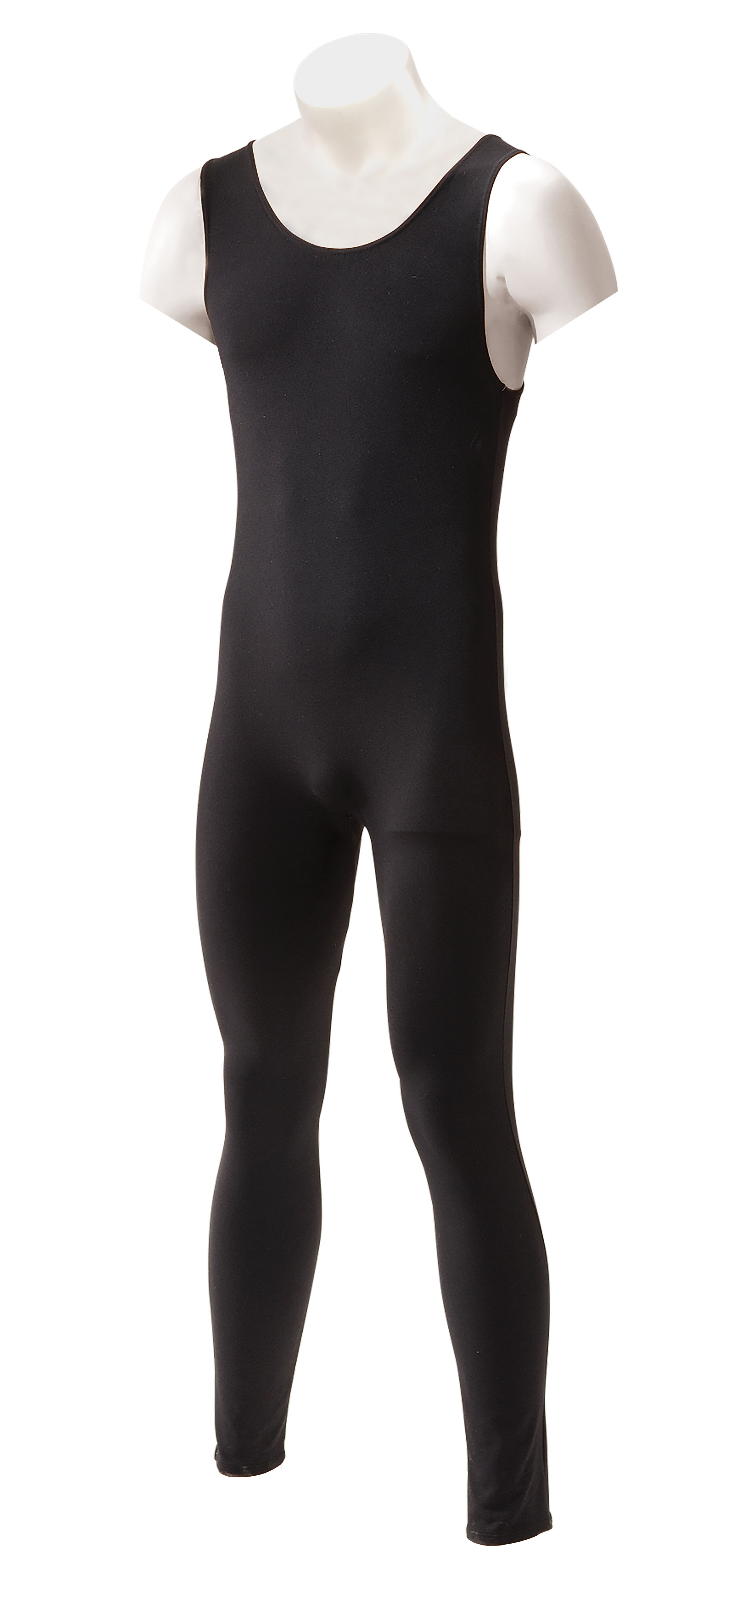 INTERMEZZO Men's and Boy's Dance Tank Style Long Unitard Cotton/Elastane Black